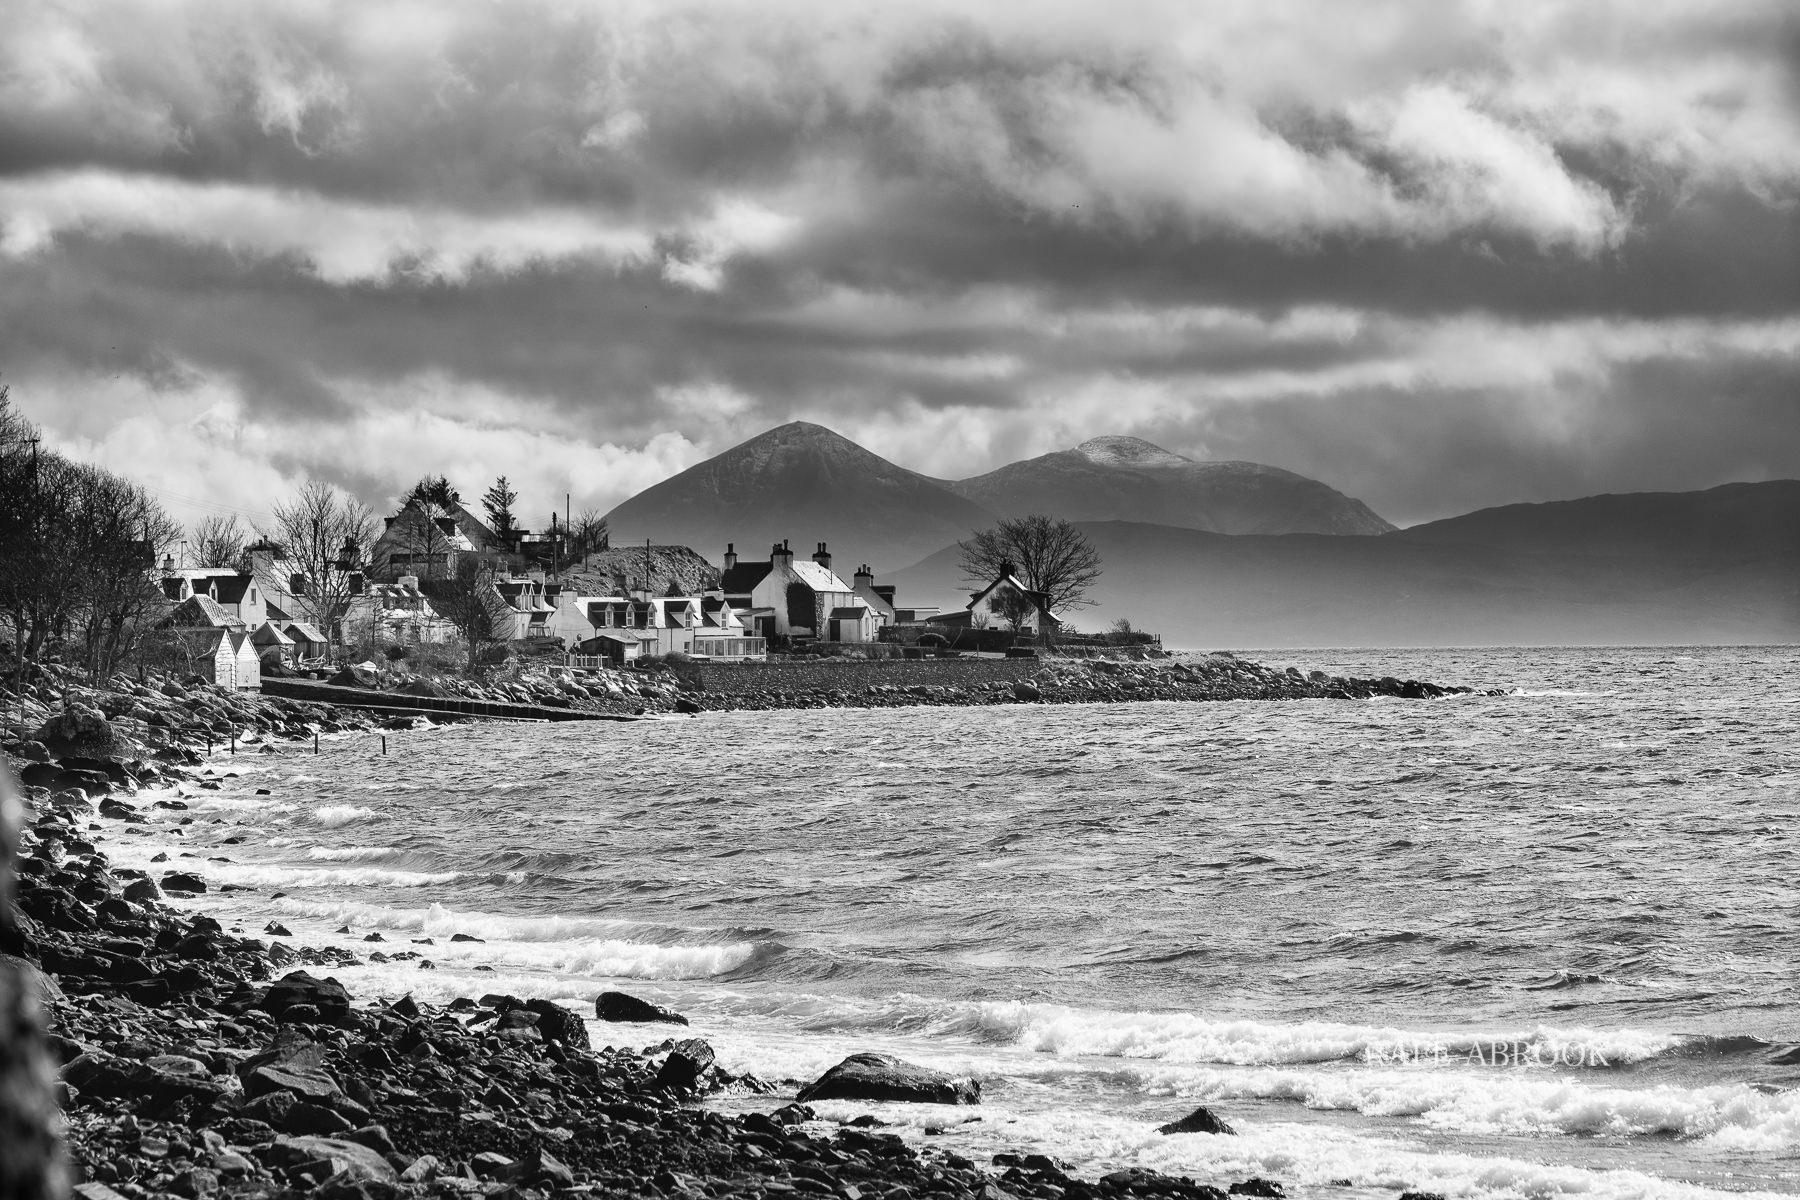 north coast 500 scotland porsche cayman gt4 golf r estate rafe abrook photography-1347.jpg